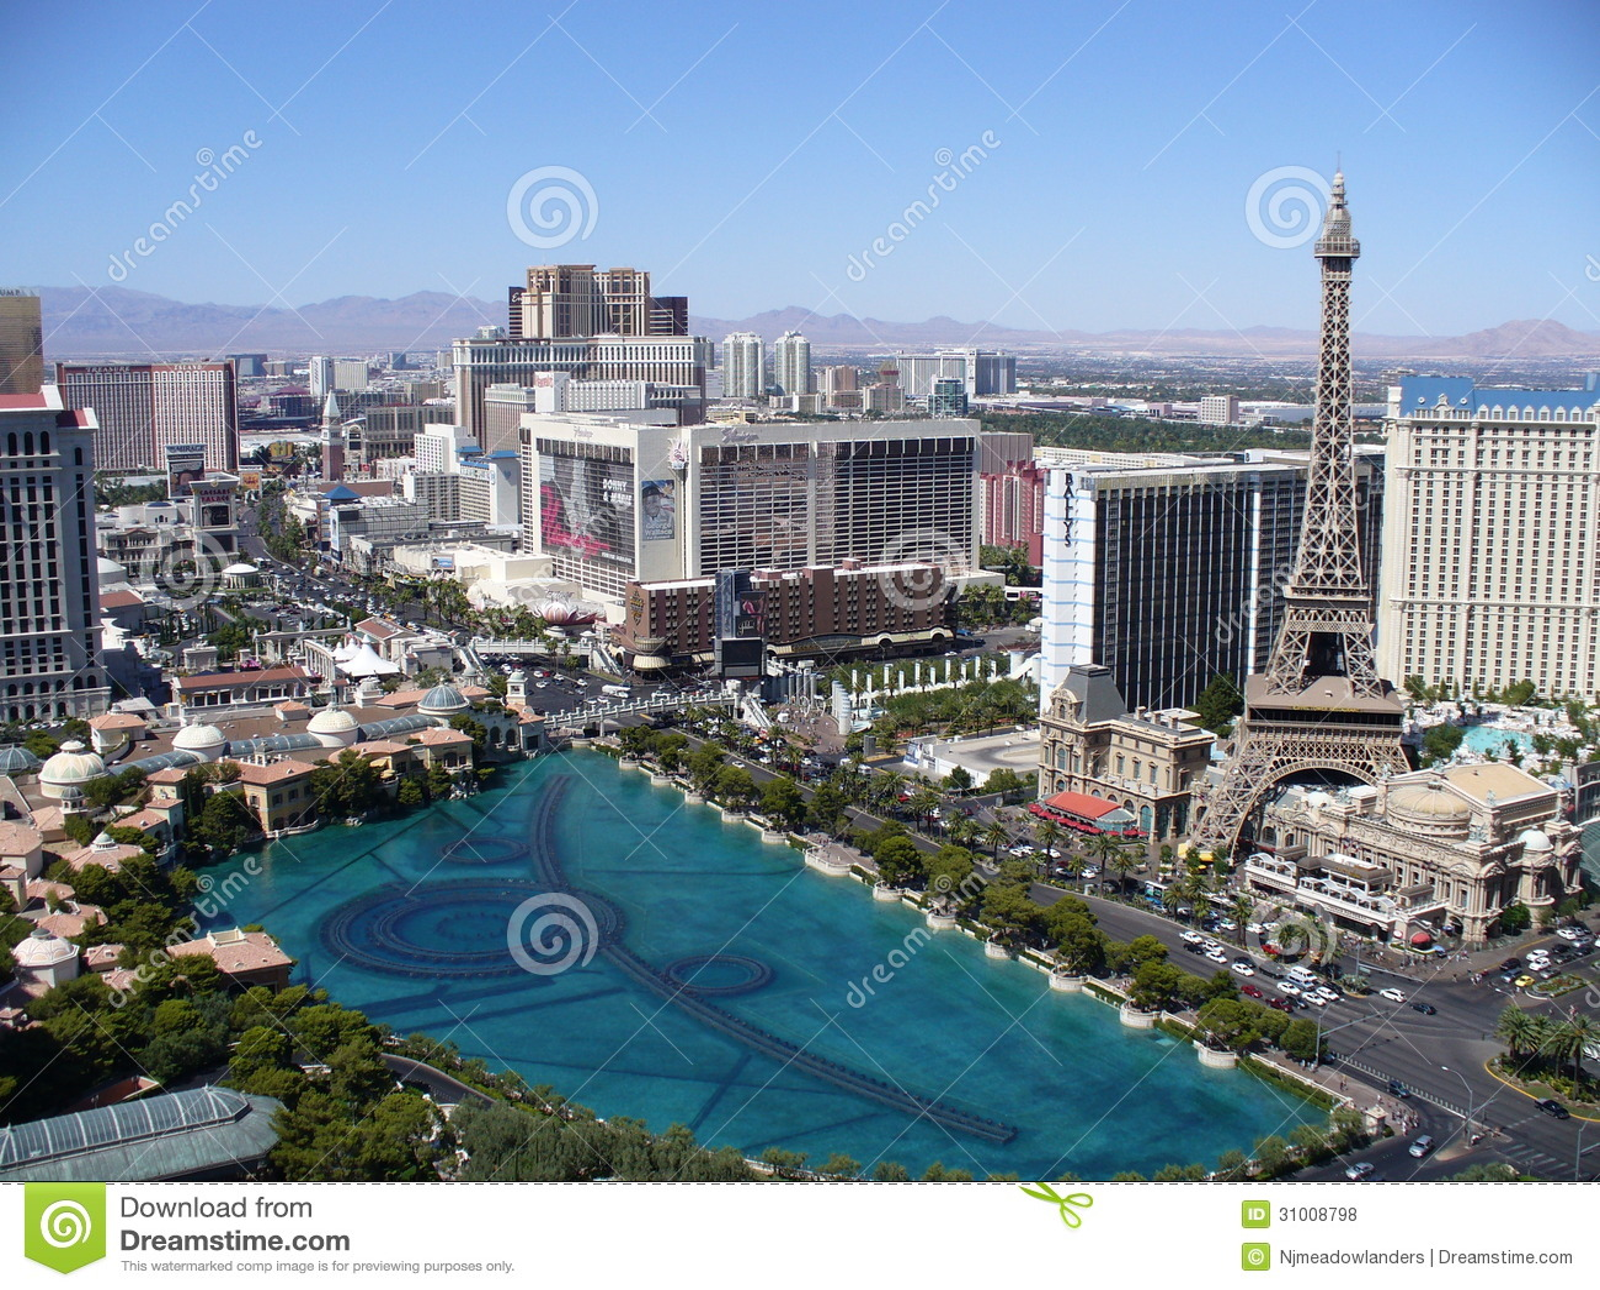 Las Vegas Strip w/ Bellagio Fountain